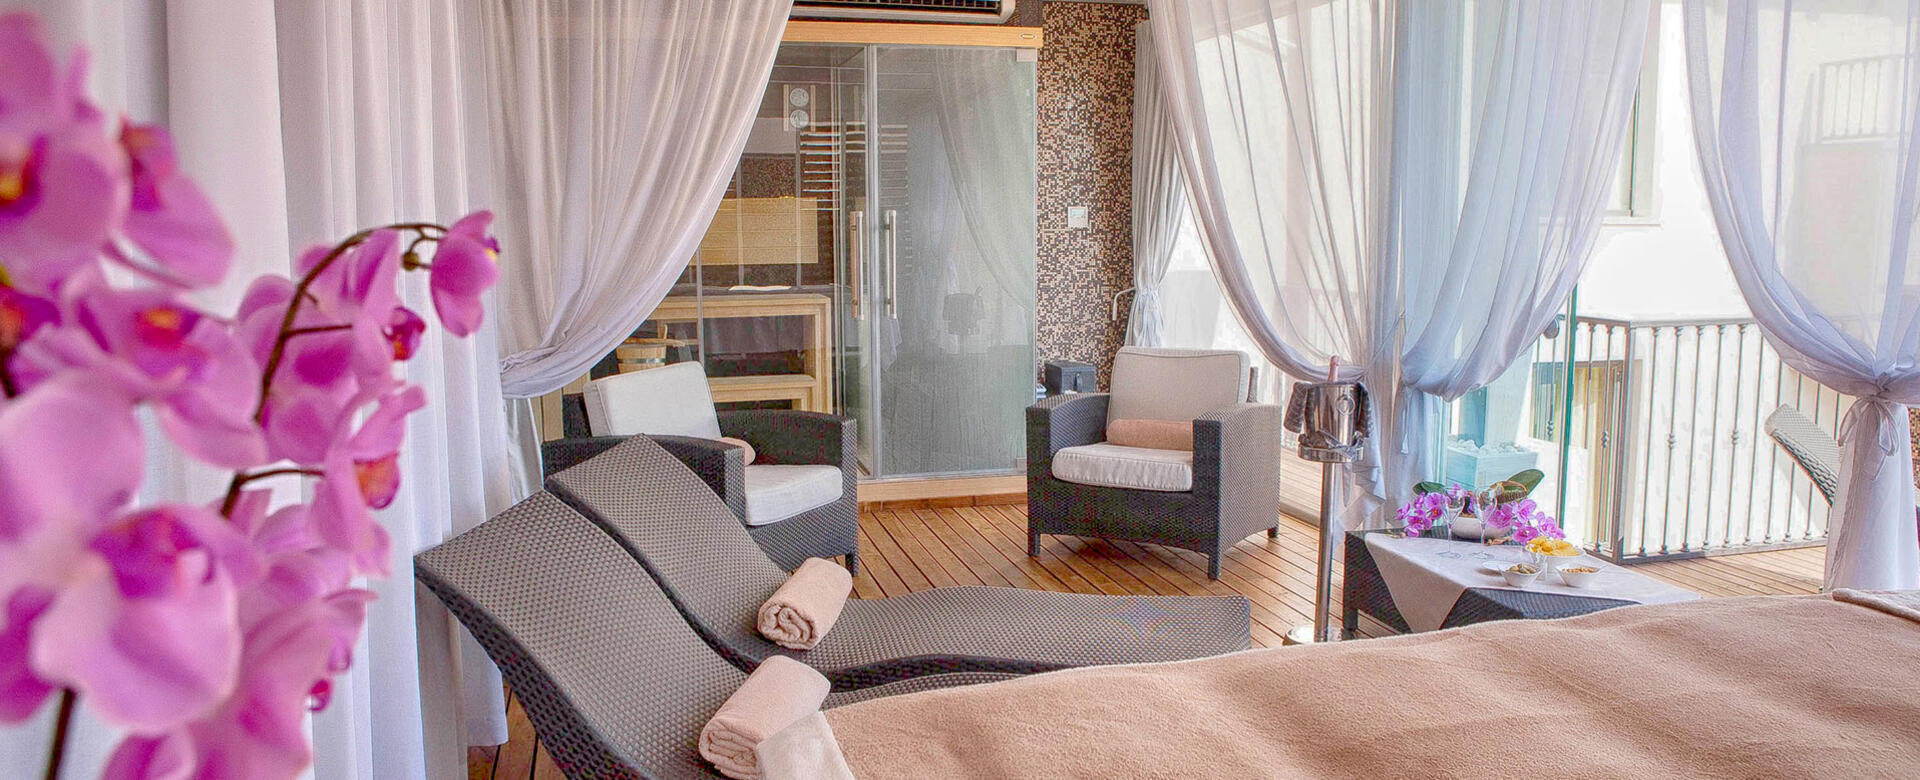 hotelvillaluisa it private-spa 003